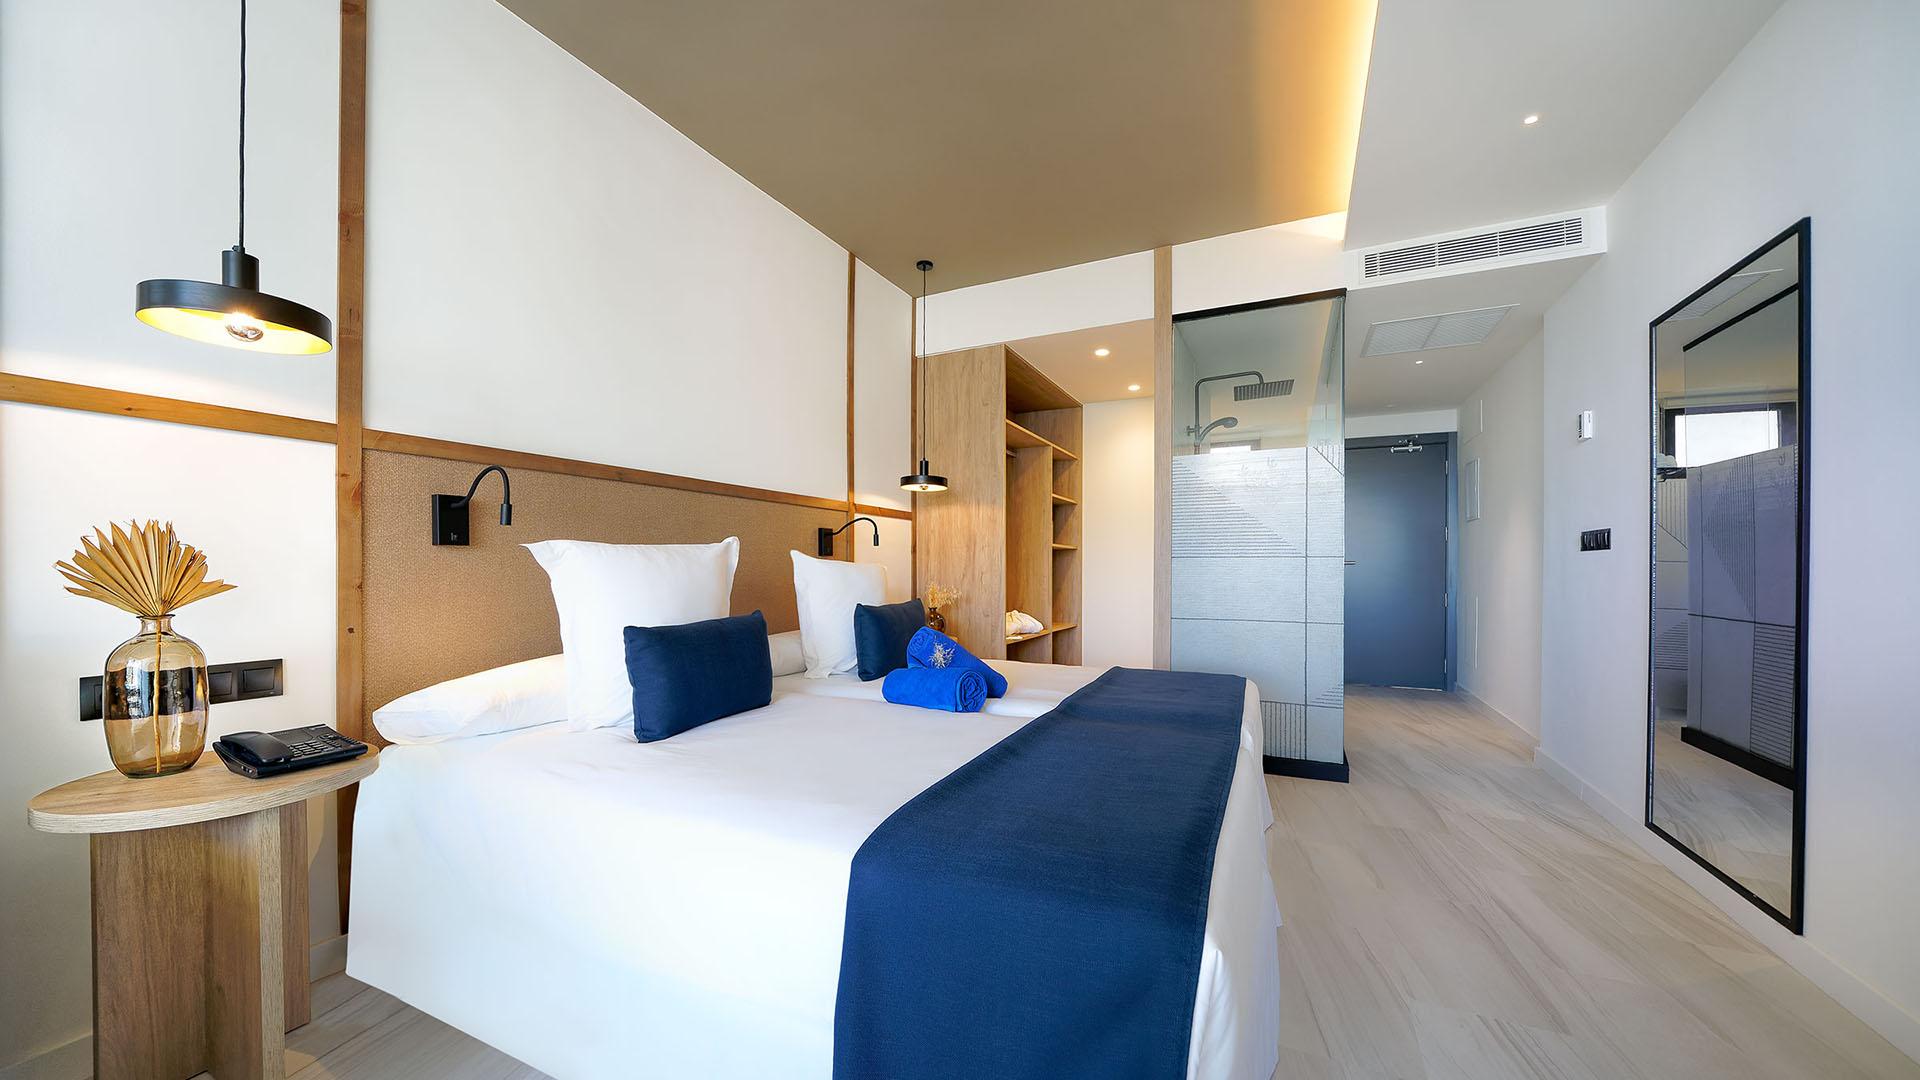 labranda-costa-mogan-hotel-gran-canaria 3636